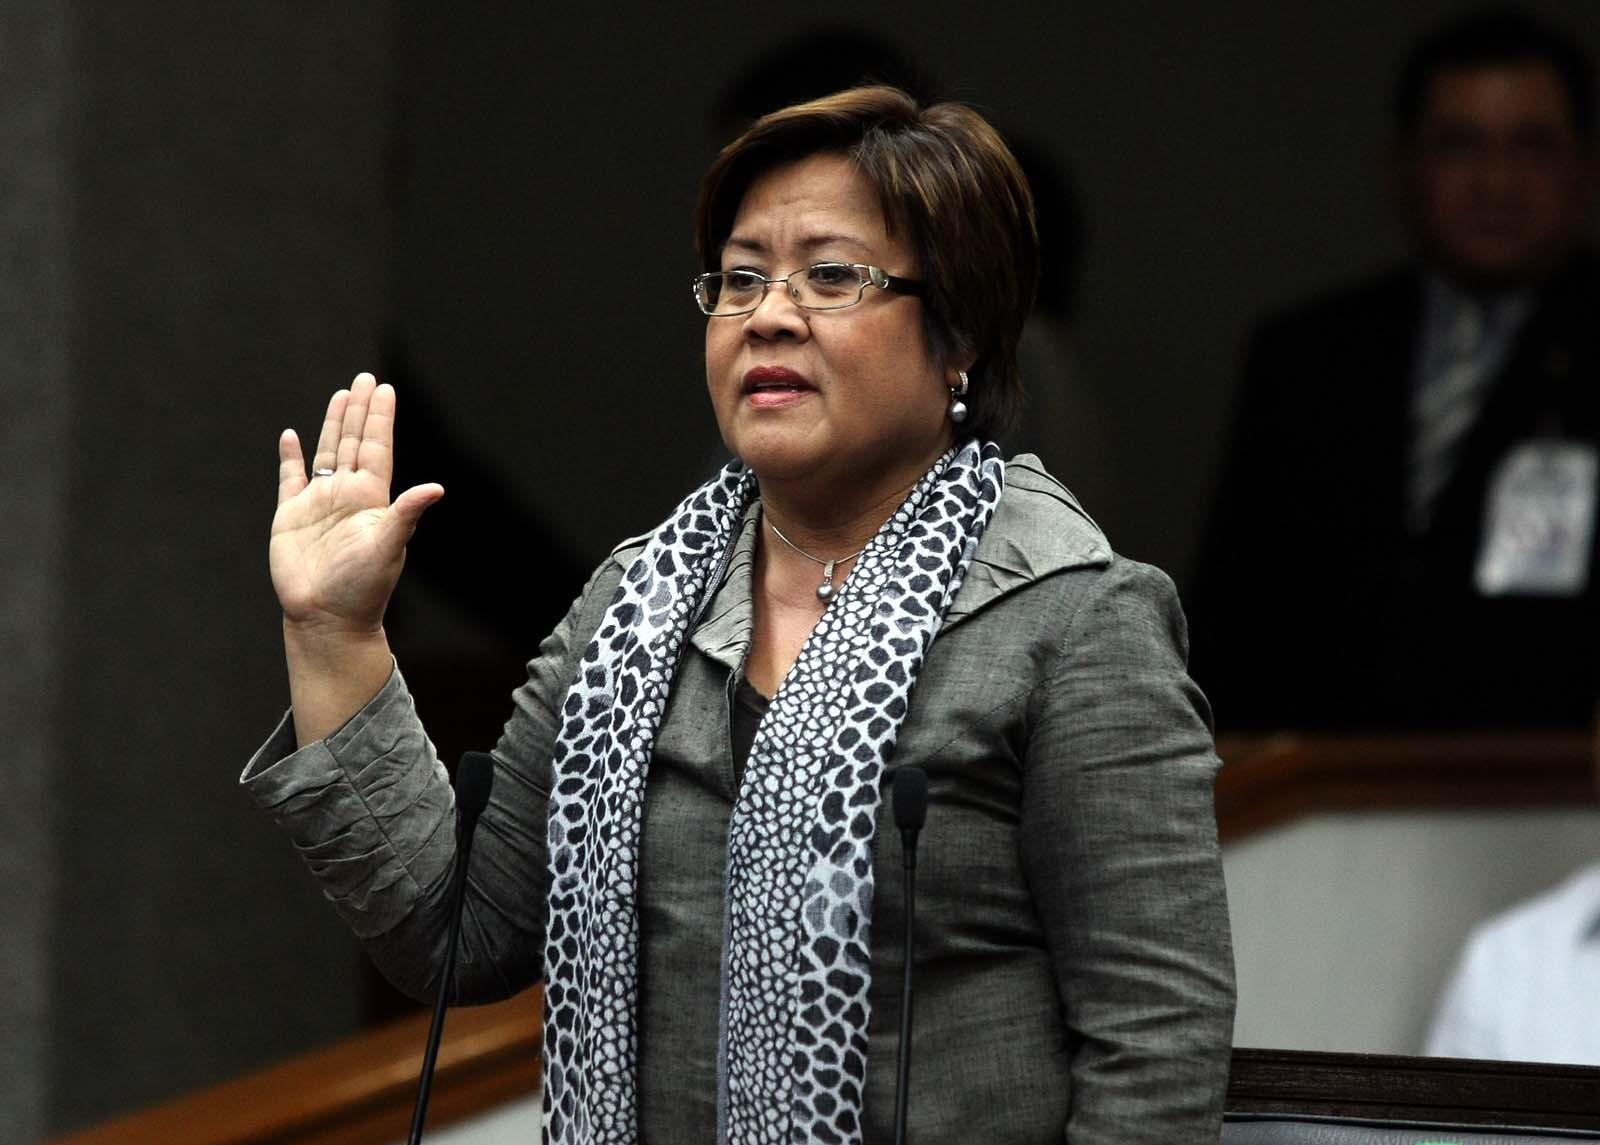 НаФилиппинах арестовали критиковавшую Дутерте сенатора